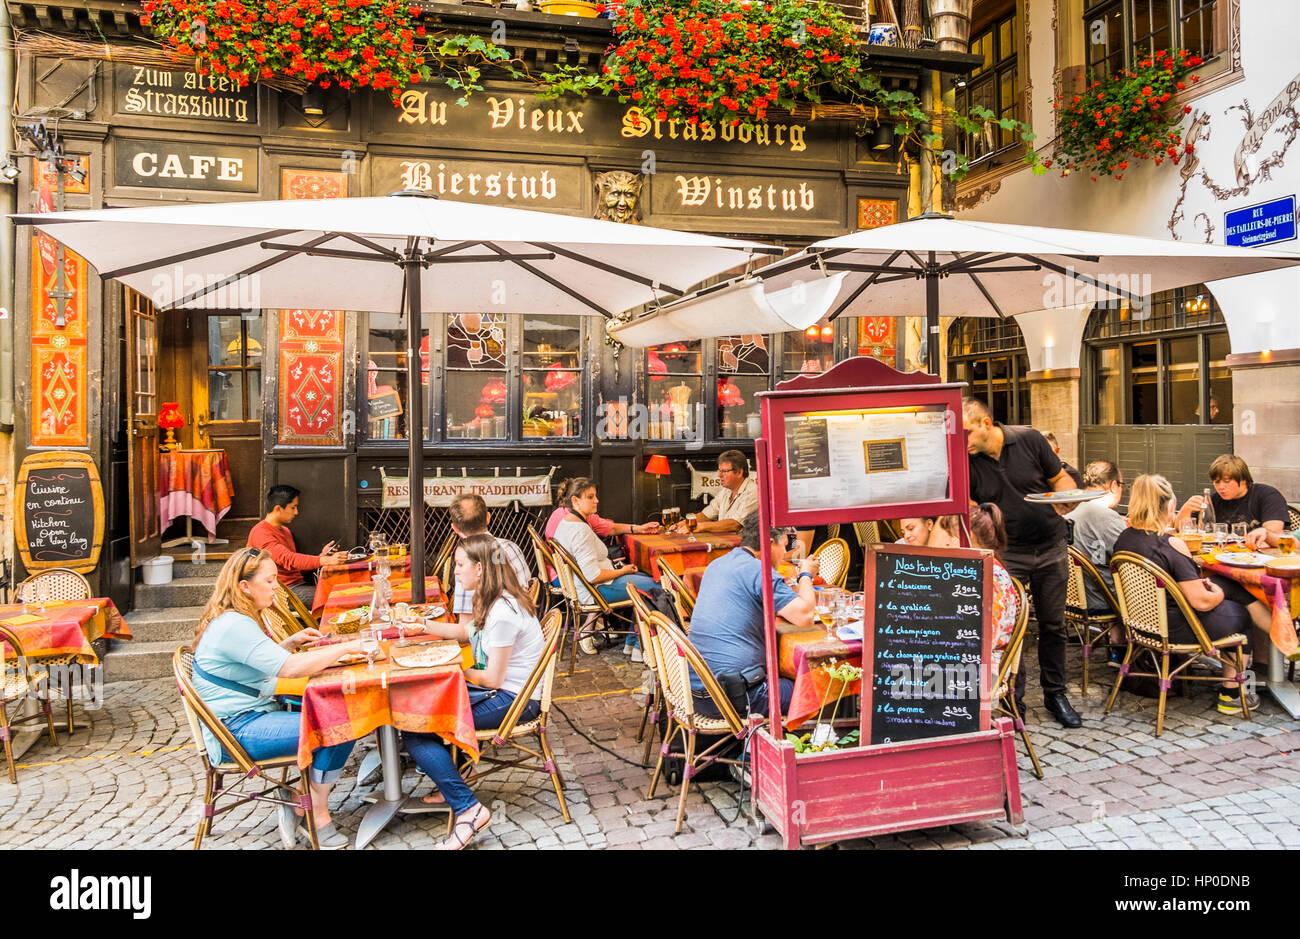 au vieux strasbourg, traditional alsatian restaurant - Stock Image